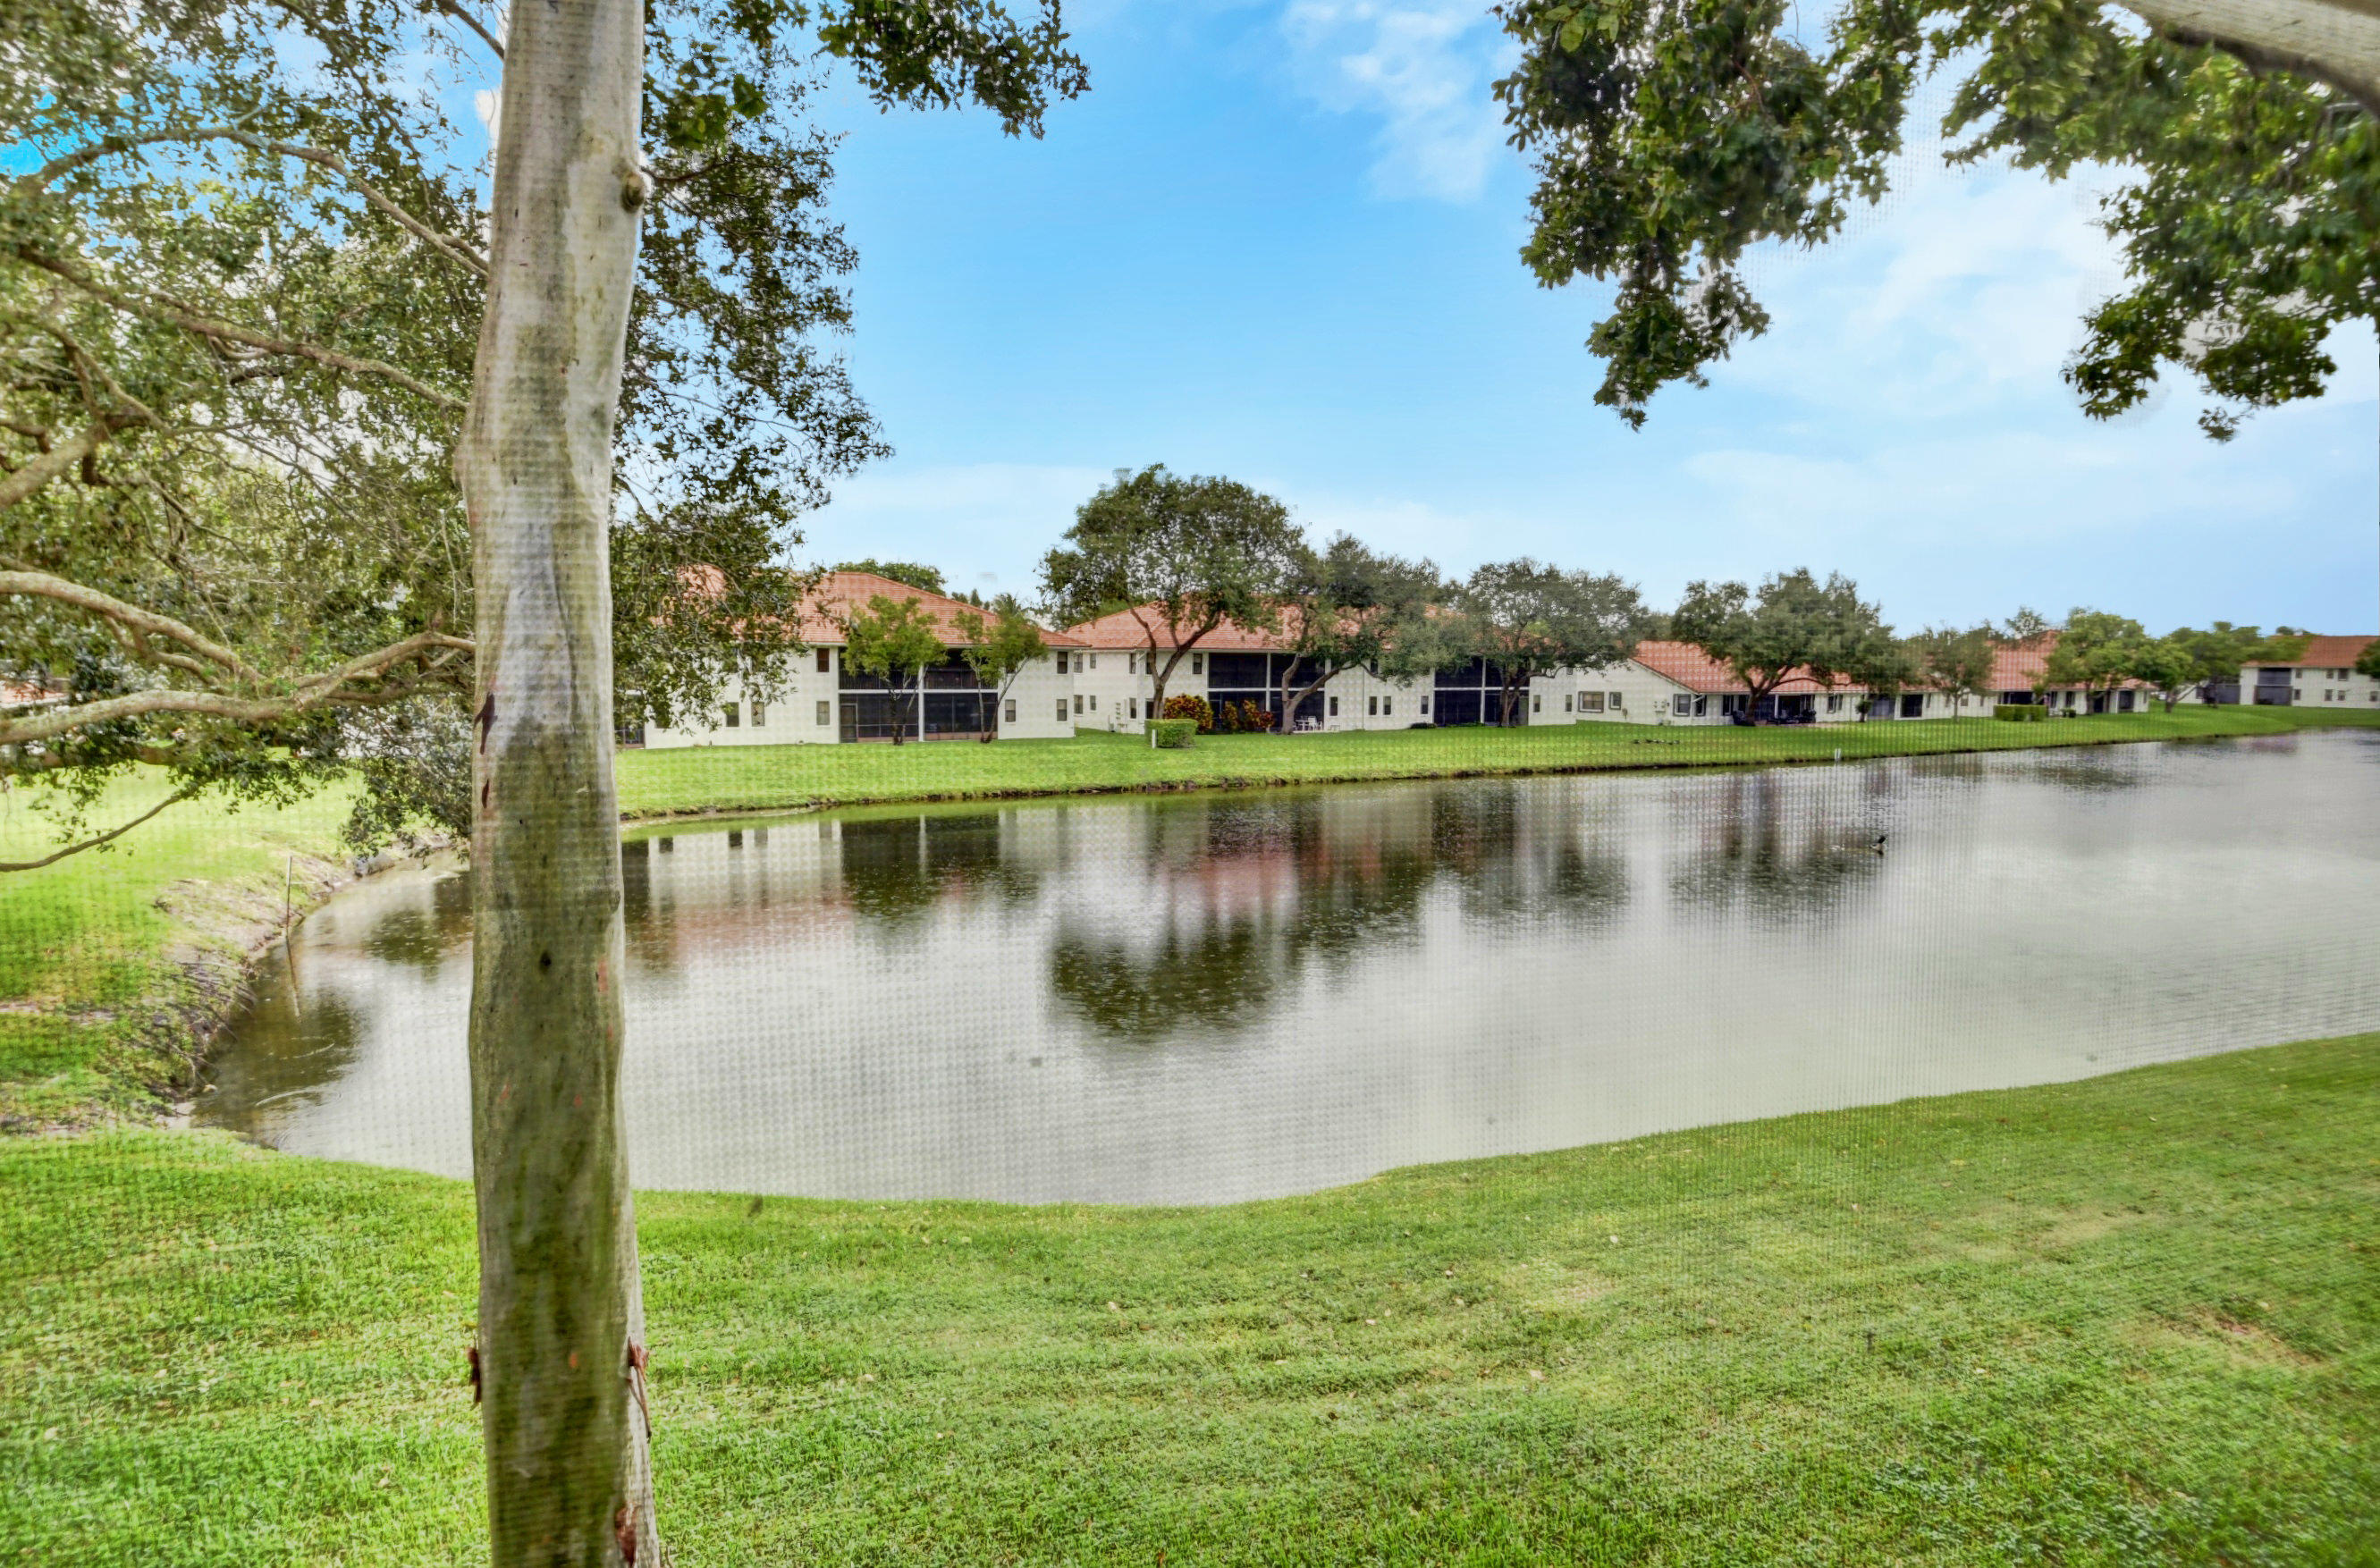 9628 Pavarotti Terrace 201 Boynton Beach, FL 33437 photo 35